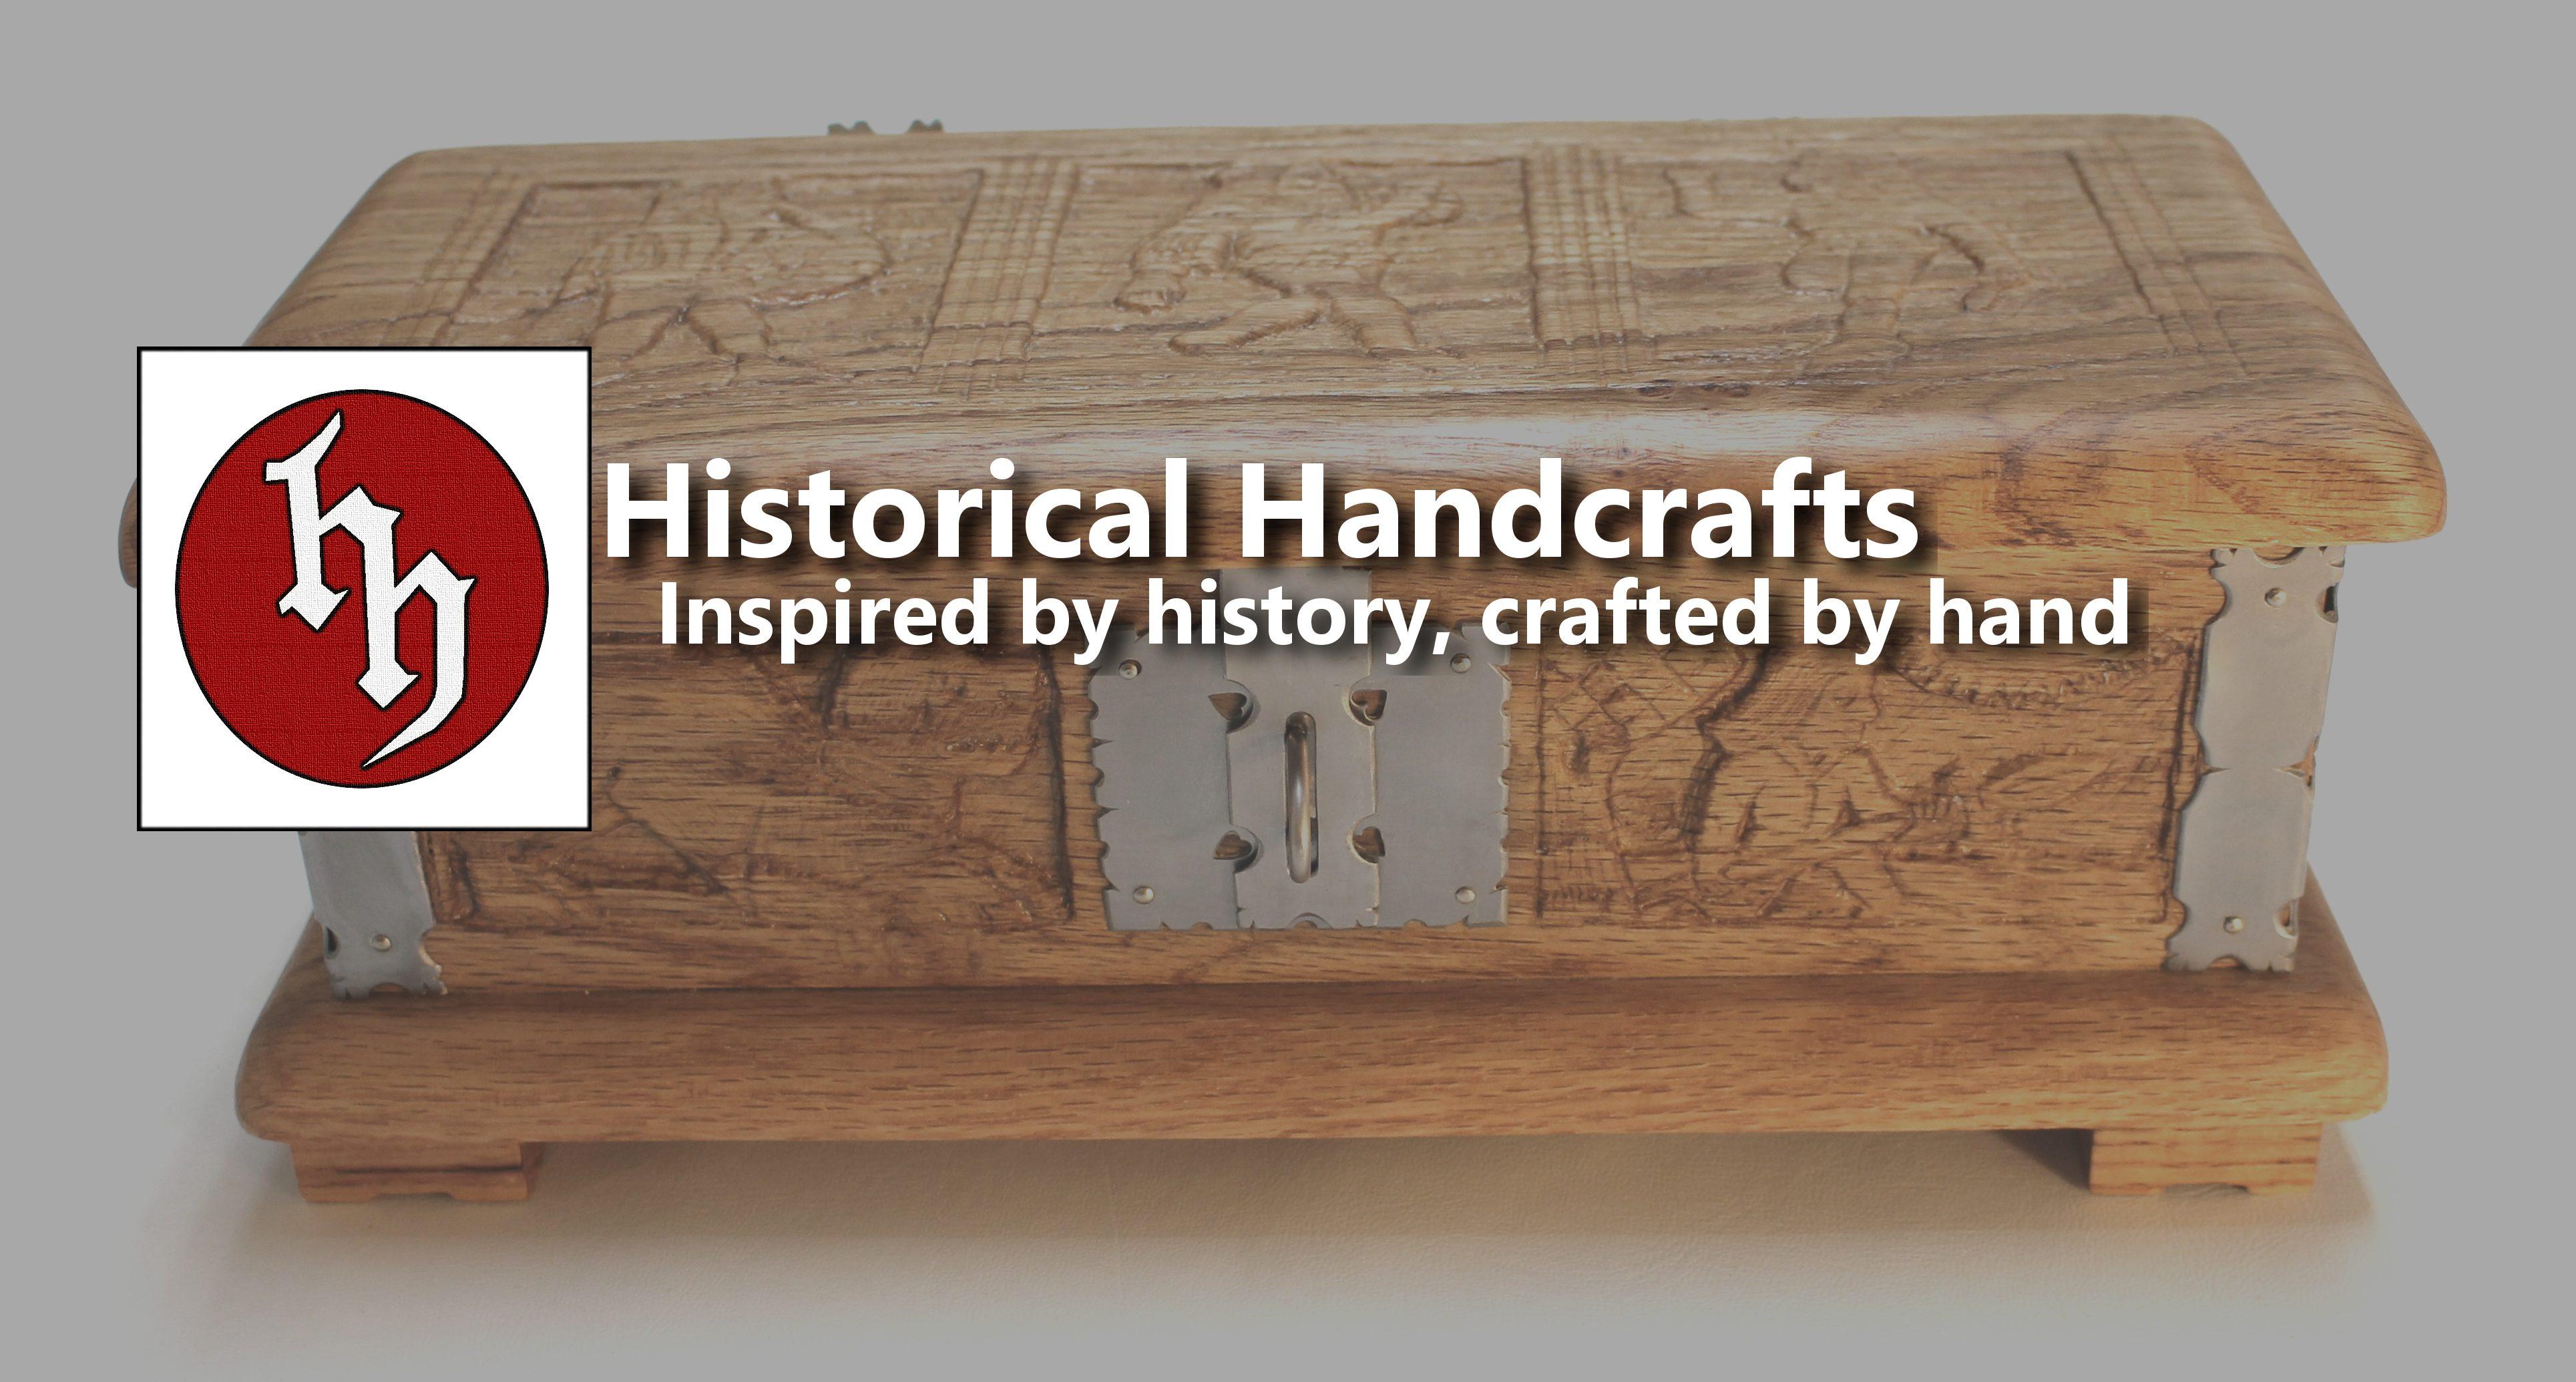 Historical Handcrafts